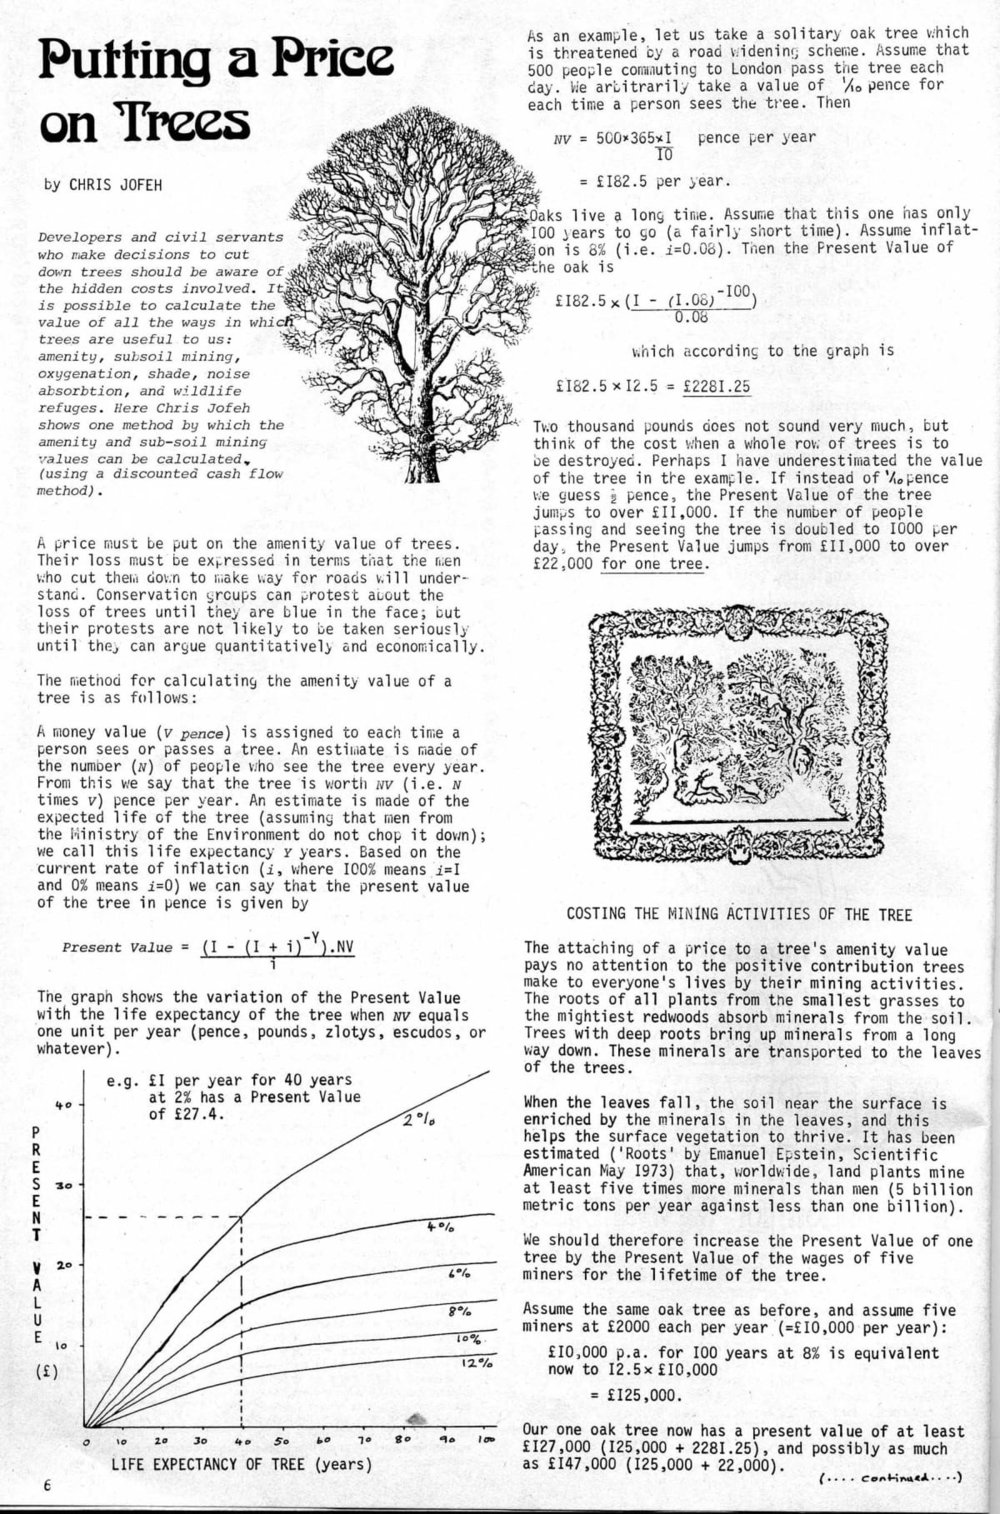 seed-v3-n1-jan1974-06.jpg